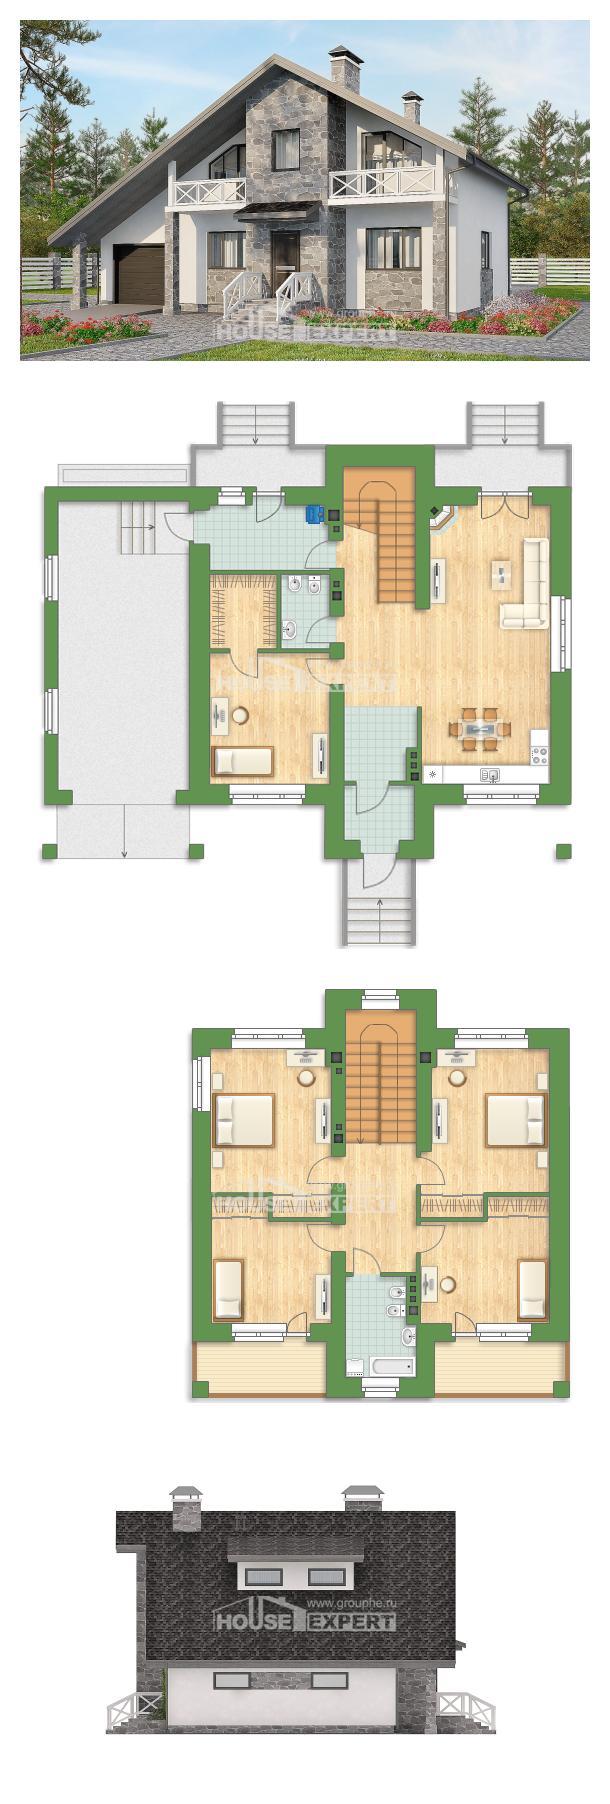 Проект дома 180-017-Л   House Expert